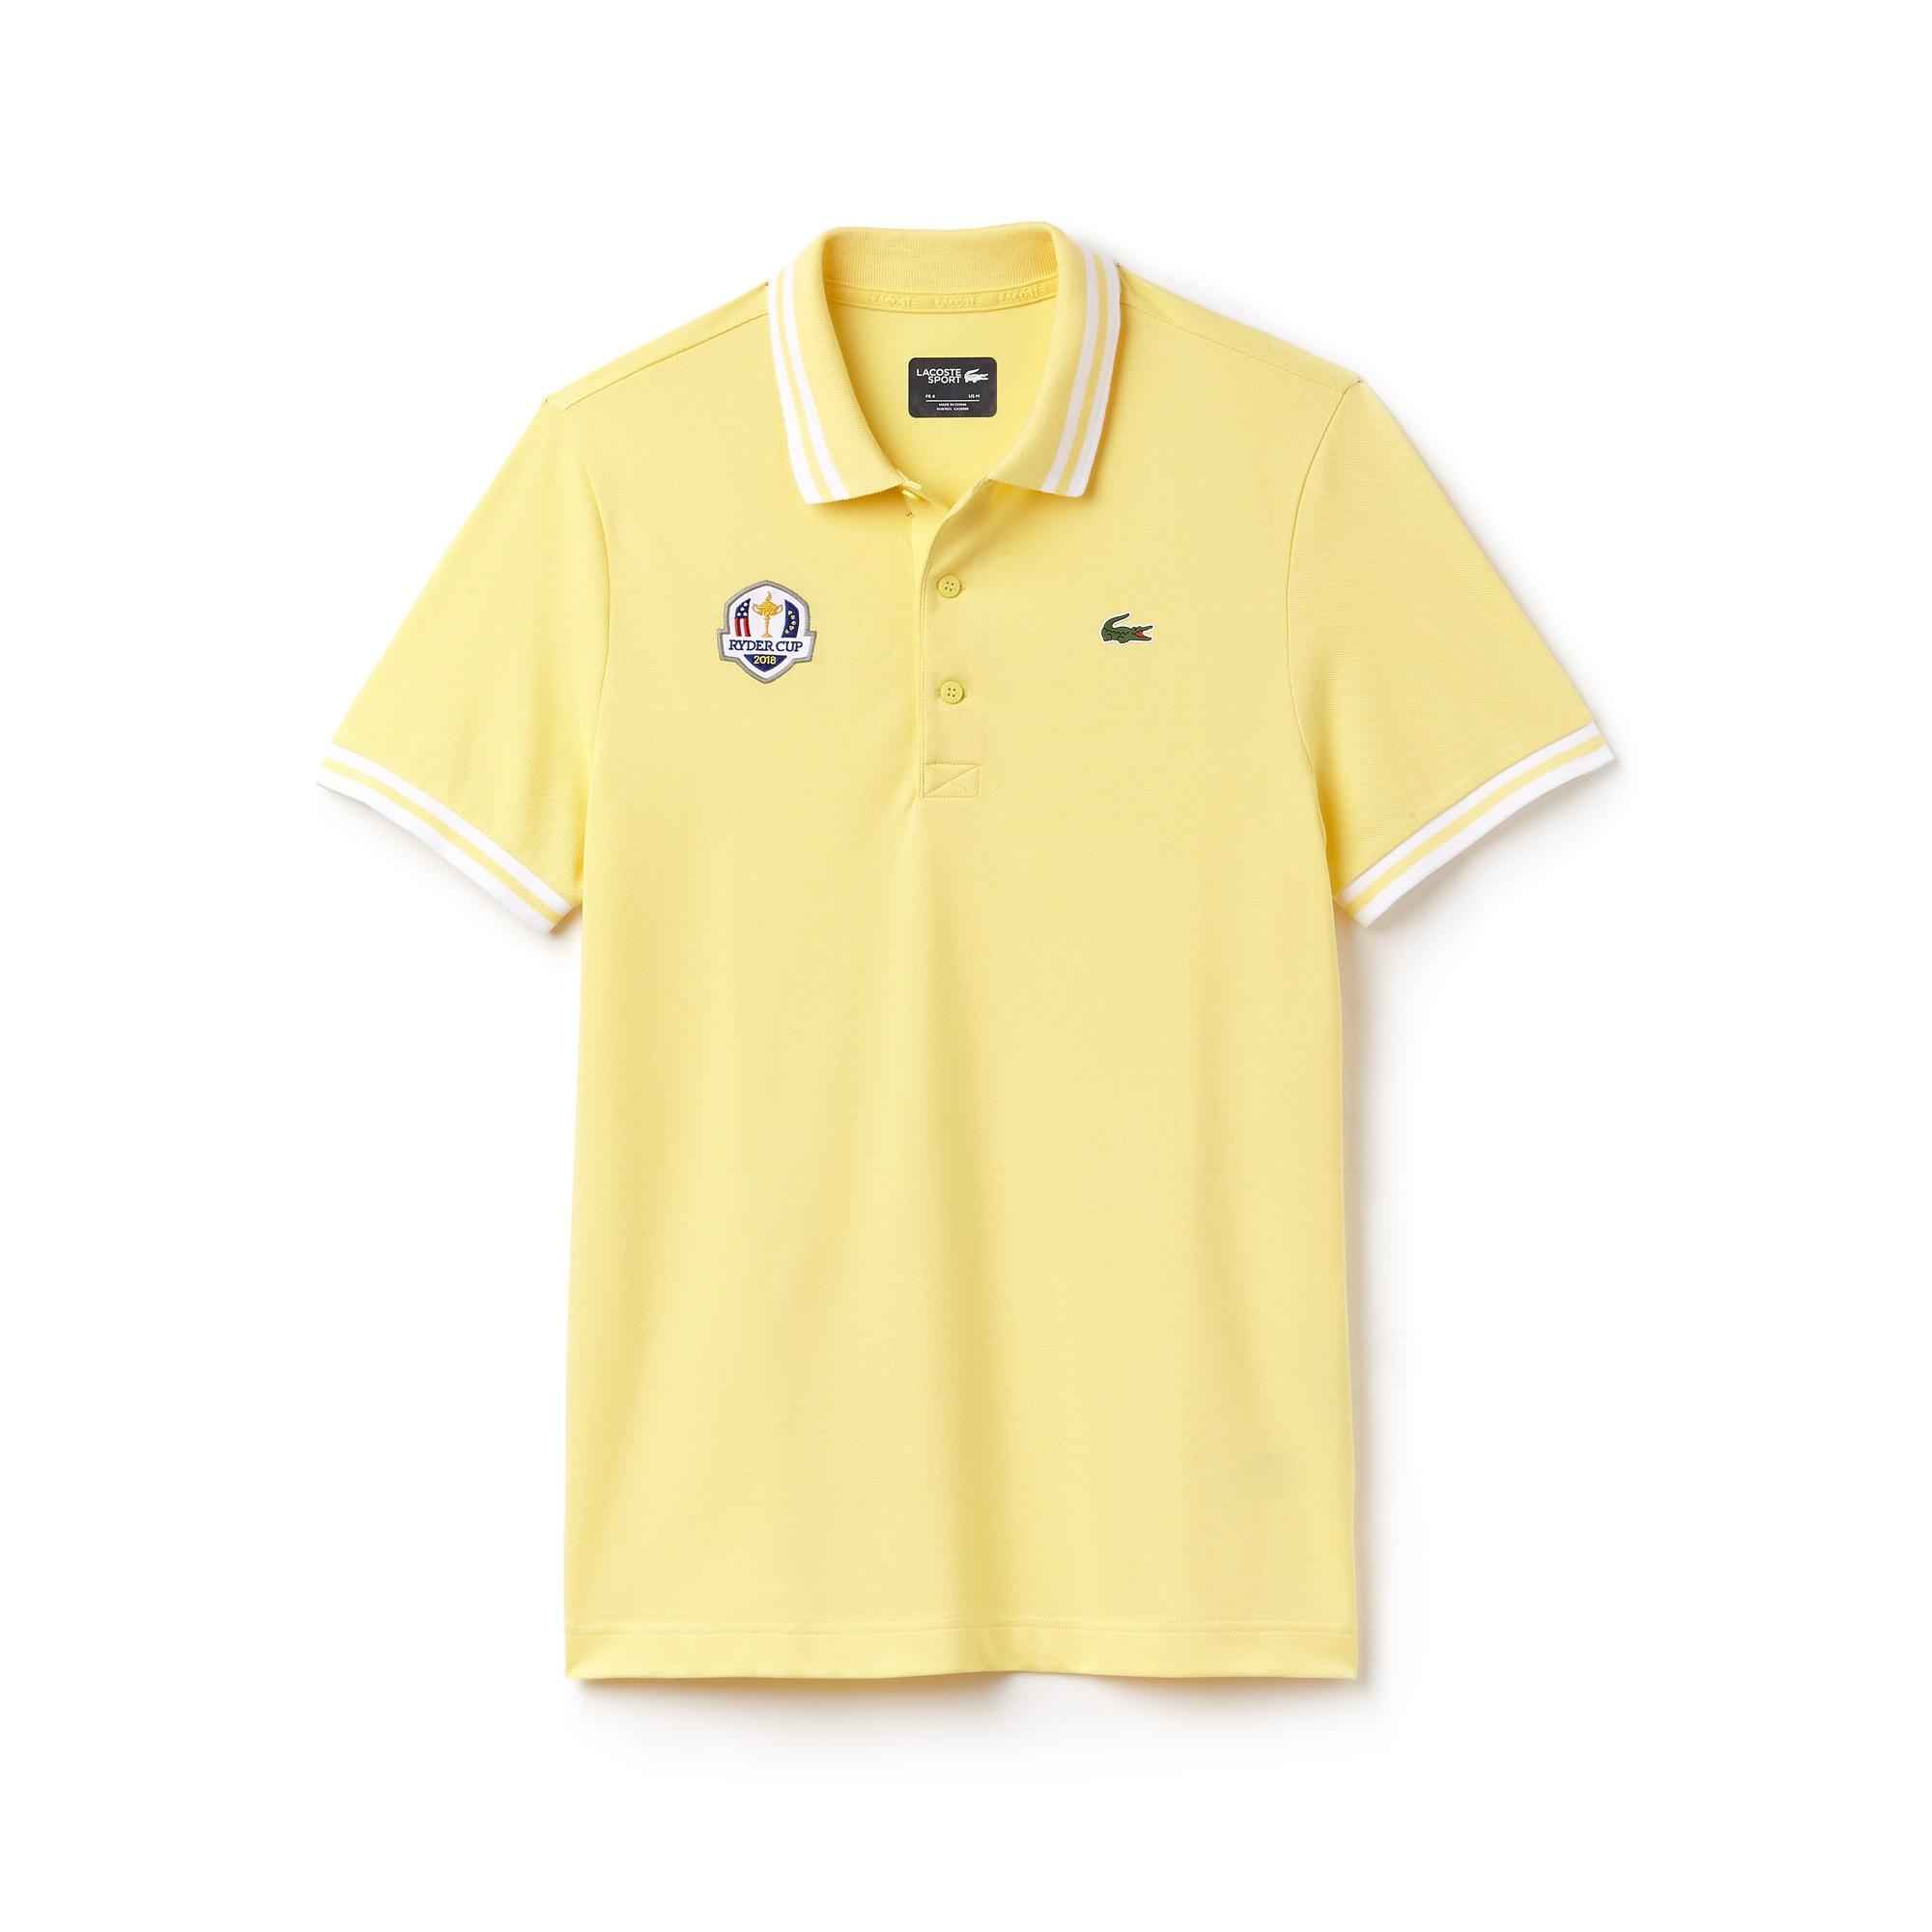 Lacoste - Herren LACOSTE SPORT Ryder Cup Edition Golf Poloshirt - 3